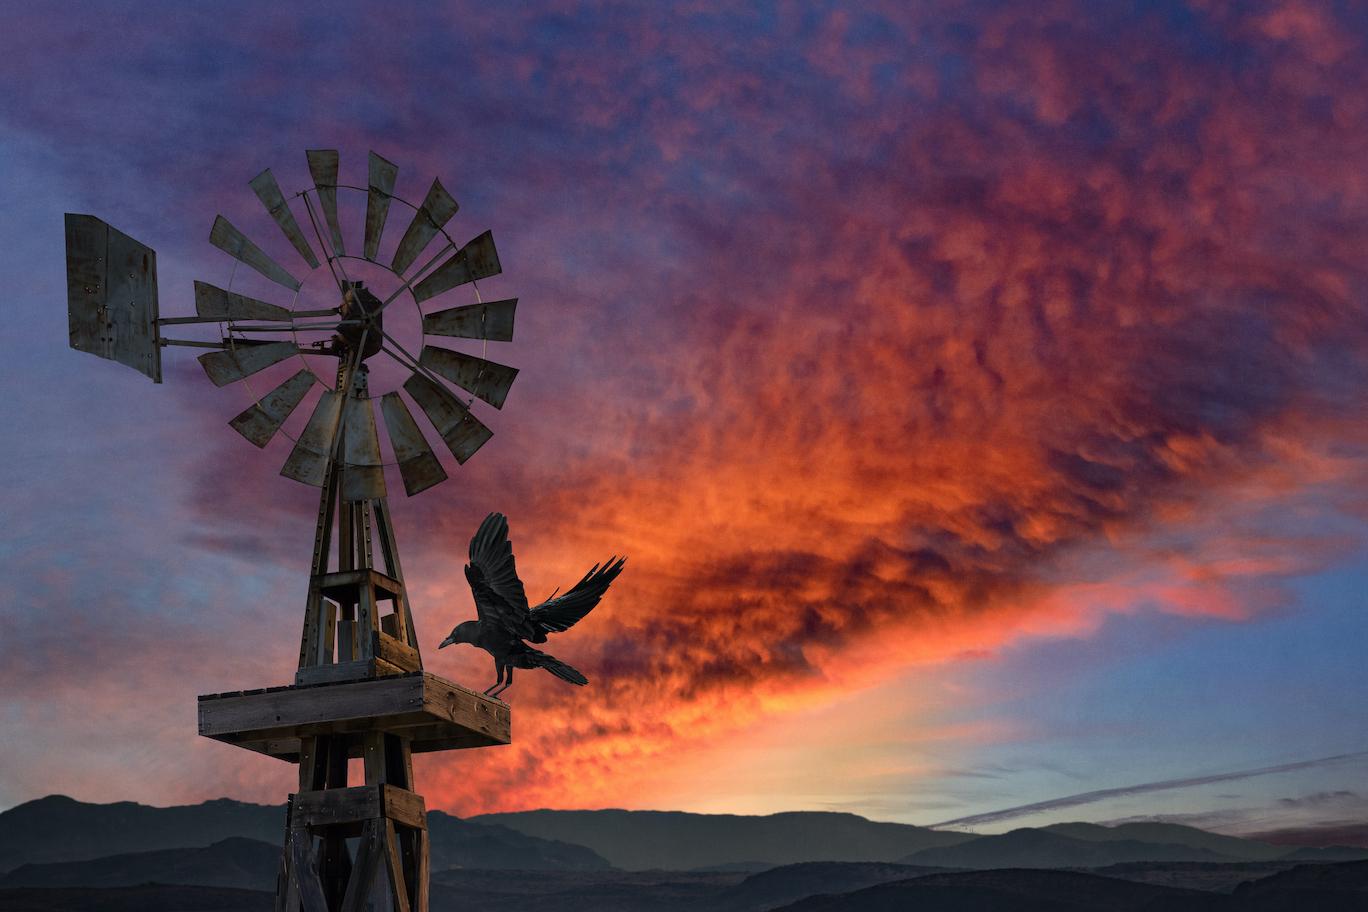 Dennis Chamberlain:  The Raven's Windmill